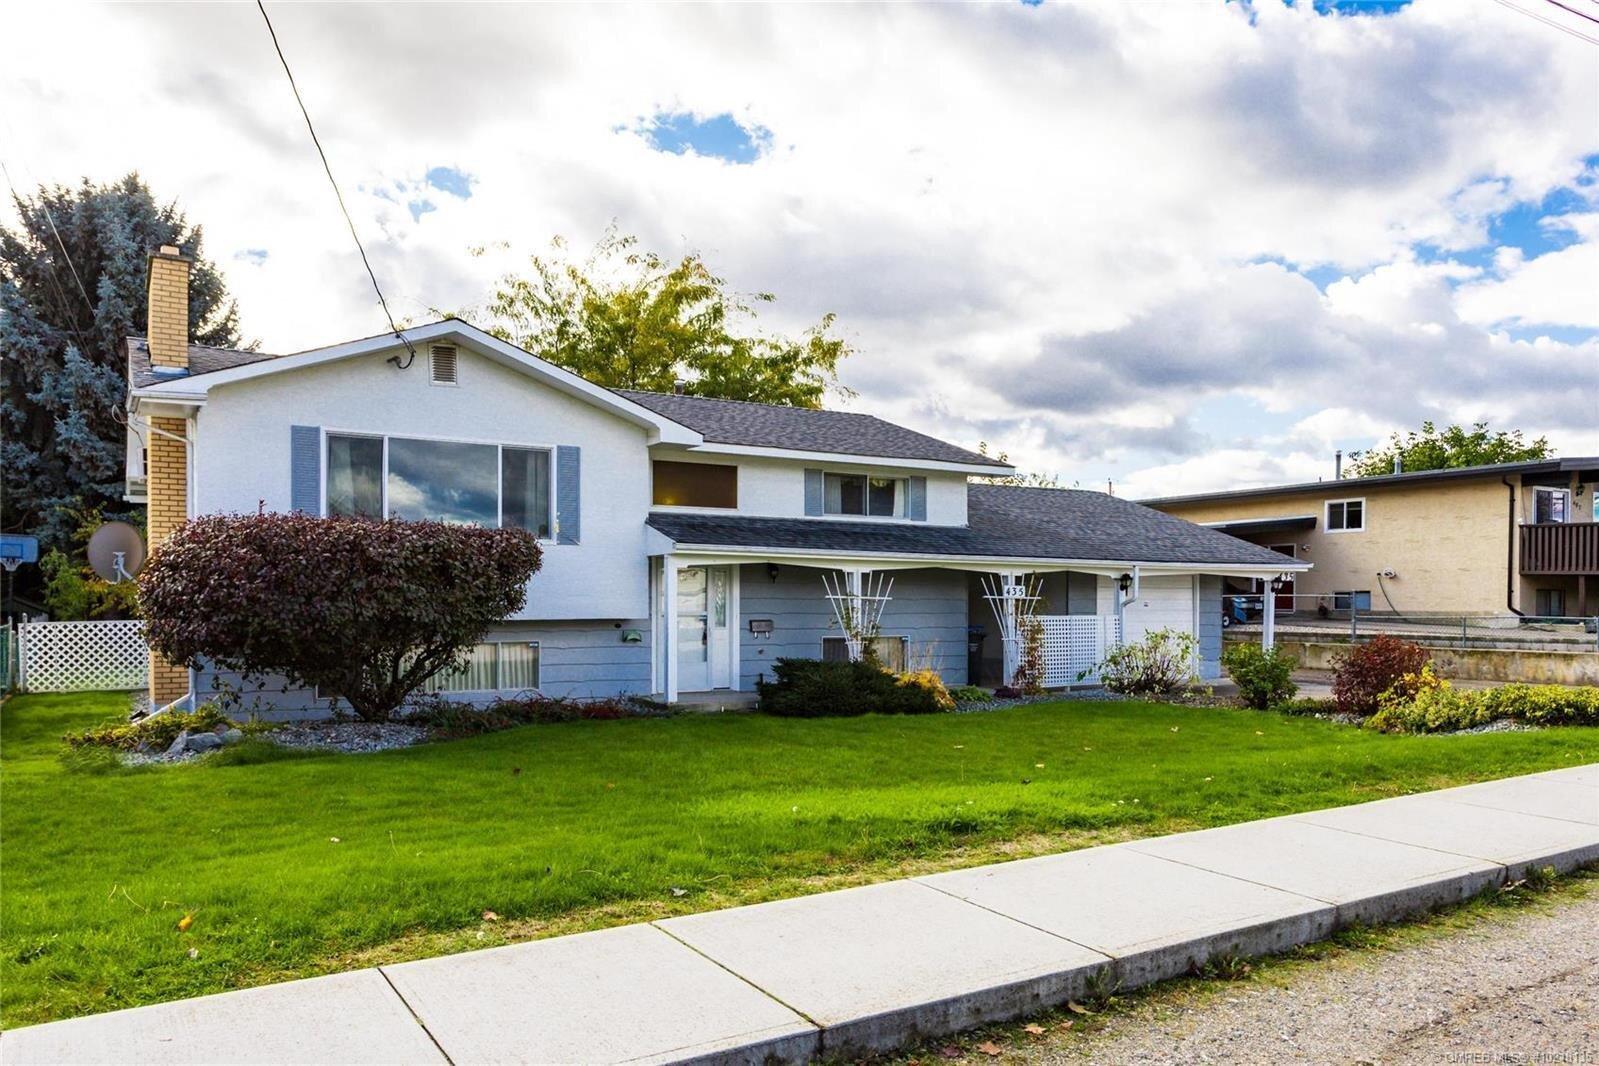 House for sale at 435 Mugford Rd Kelowna British Columbia - MLS: 10218135